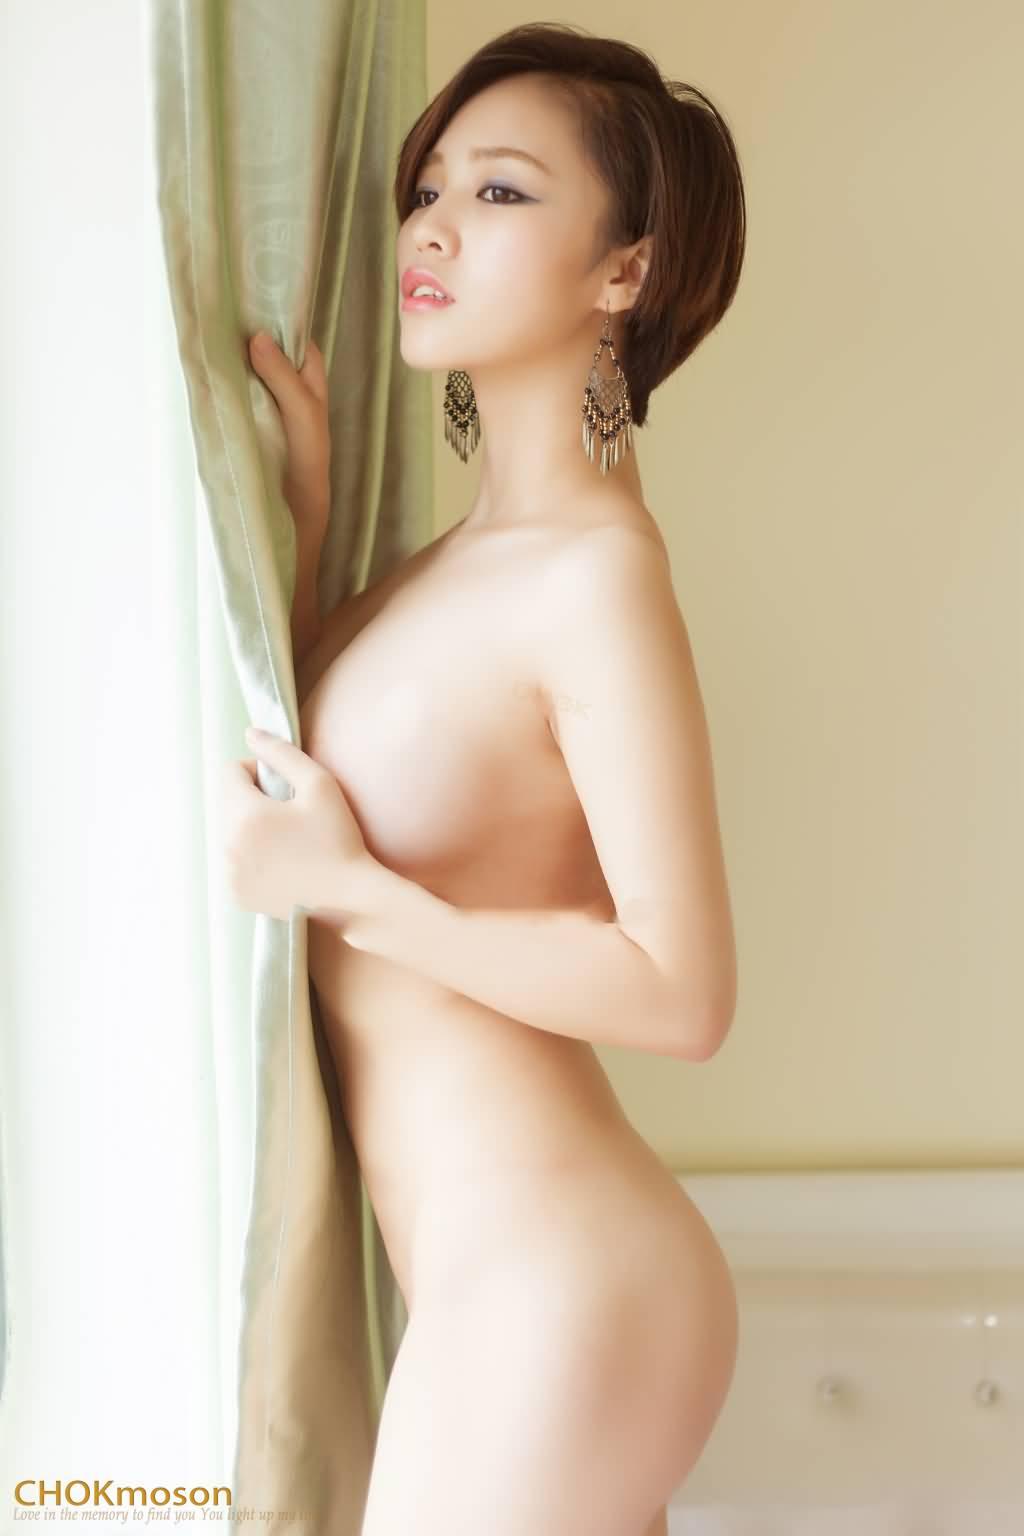 CHOKmoson脱神作品《大胸妹》50P/741M